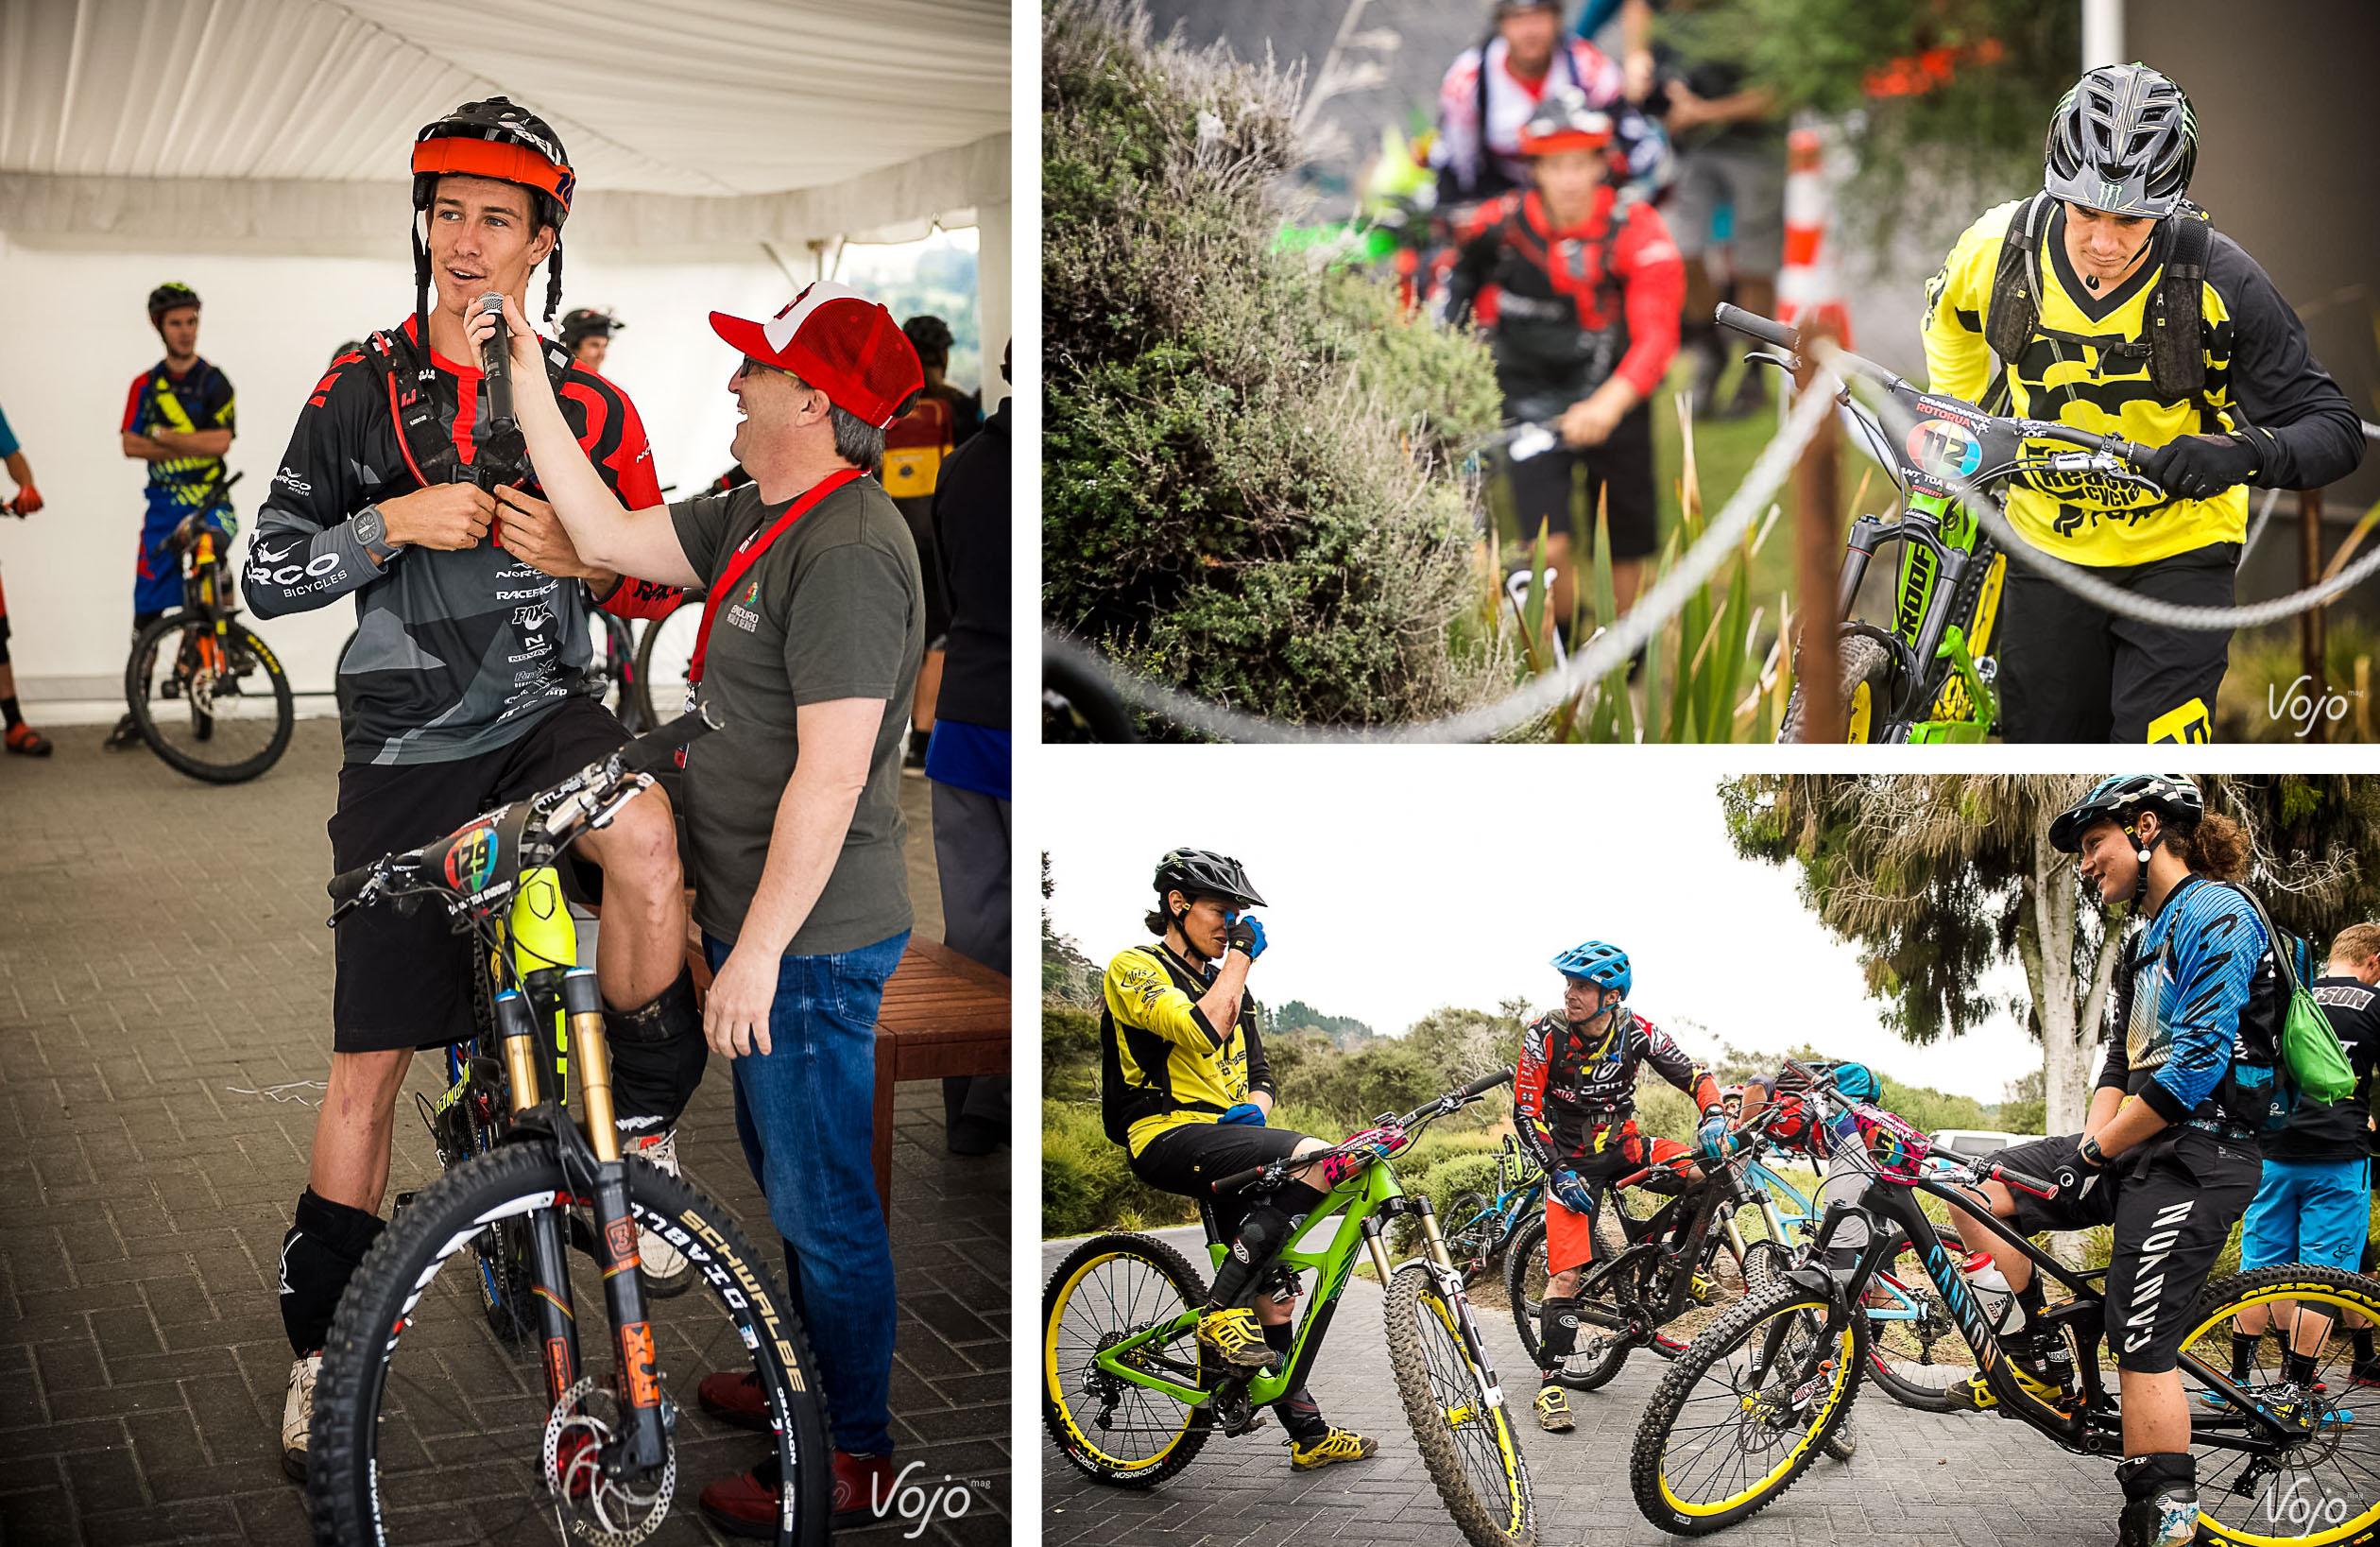 Compo1_Enduro_World_Series_Rotorua_Copyright_Simone_Lanciotti_MTBCult_VojoMag-1